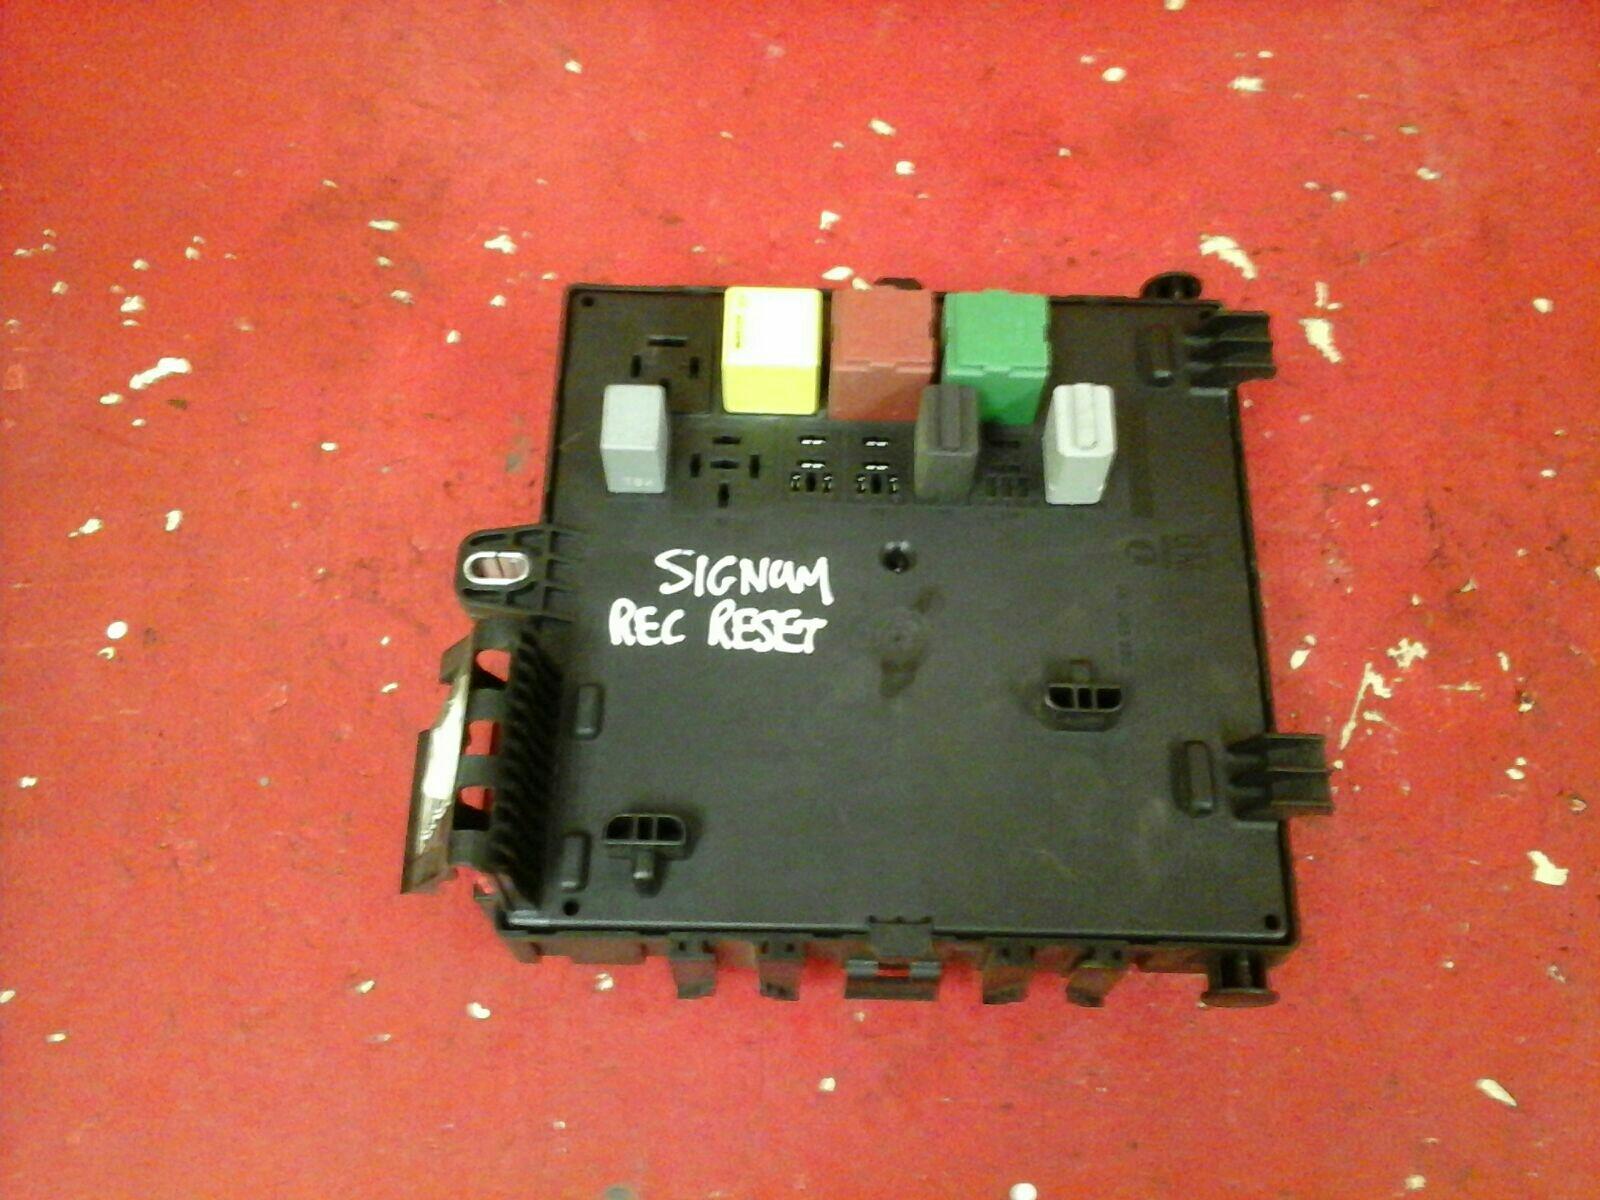 SIGNUM + VAUXHALL VECTRA C REAR ELECTRIC CONTROL REC FUSE BOX ER 02-09